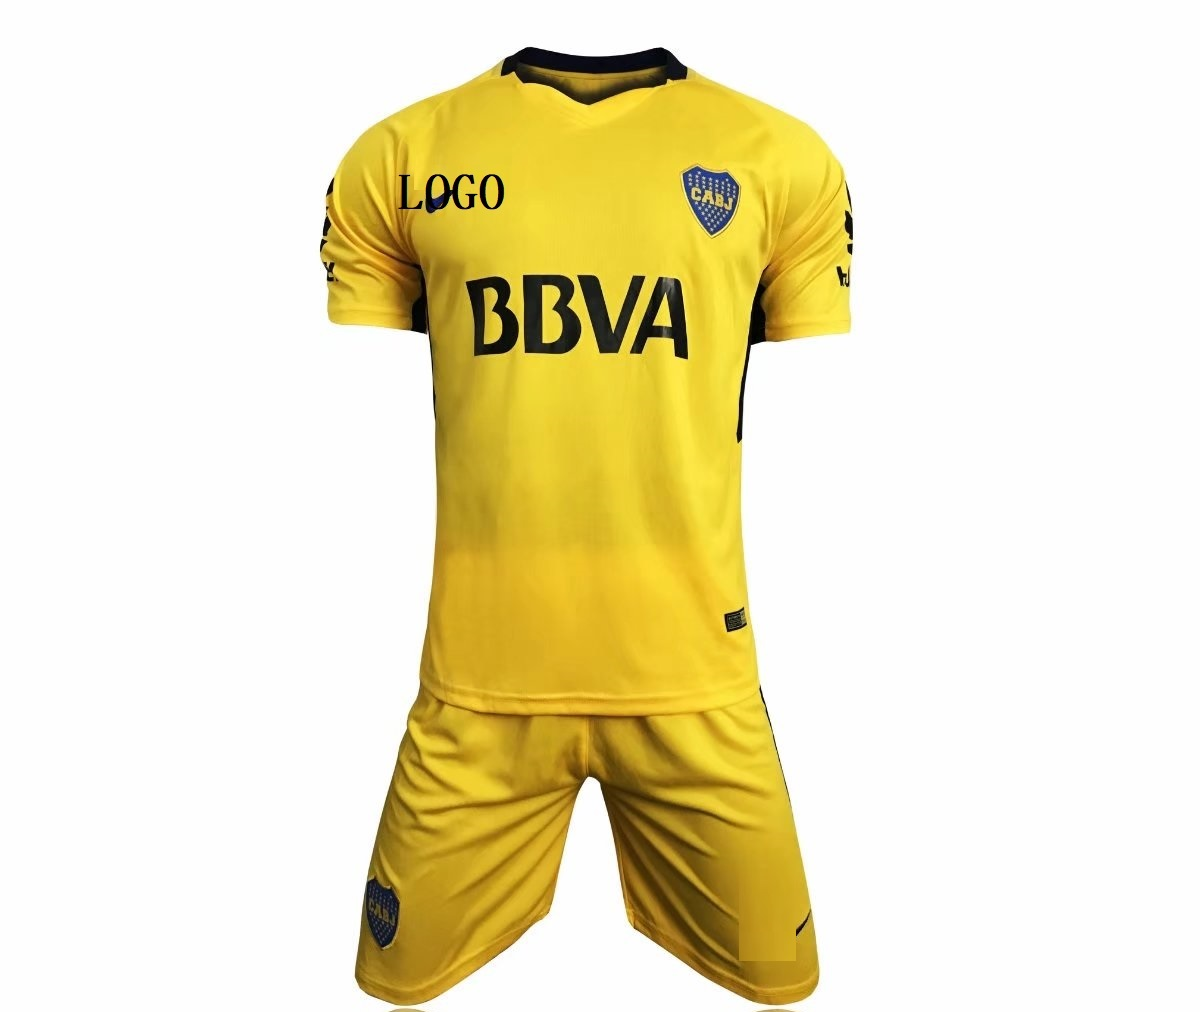 edb03777e9b Boca Juniors 2017-2018 away Yellow Soccer Jersey Uniforms Adult Football  Kits Item NO  444242